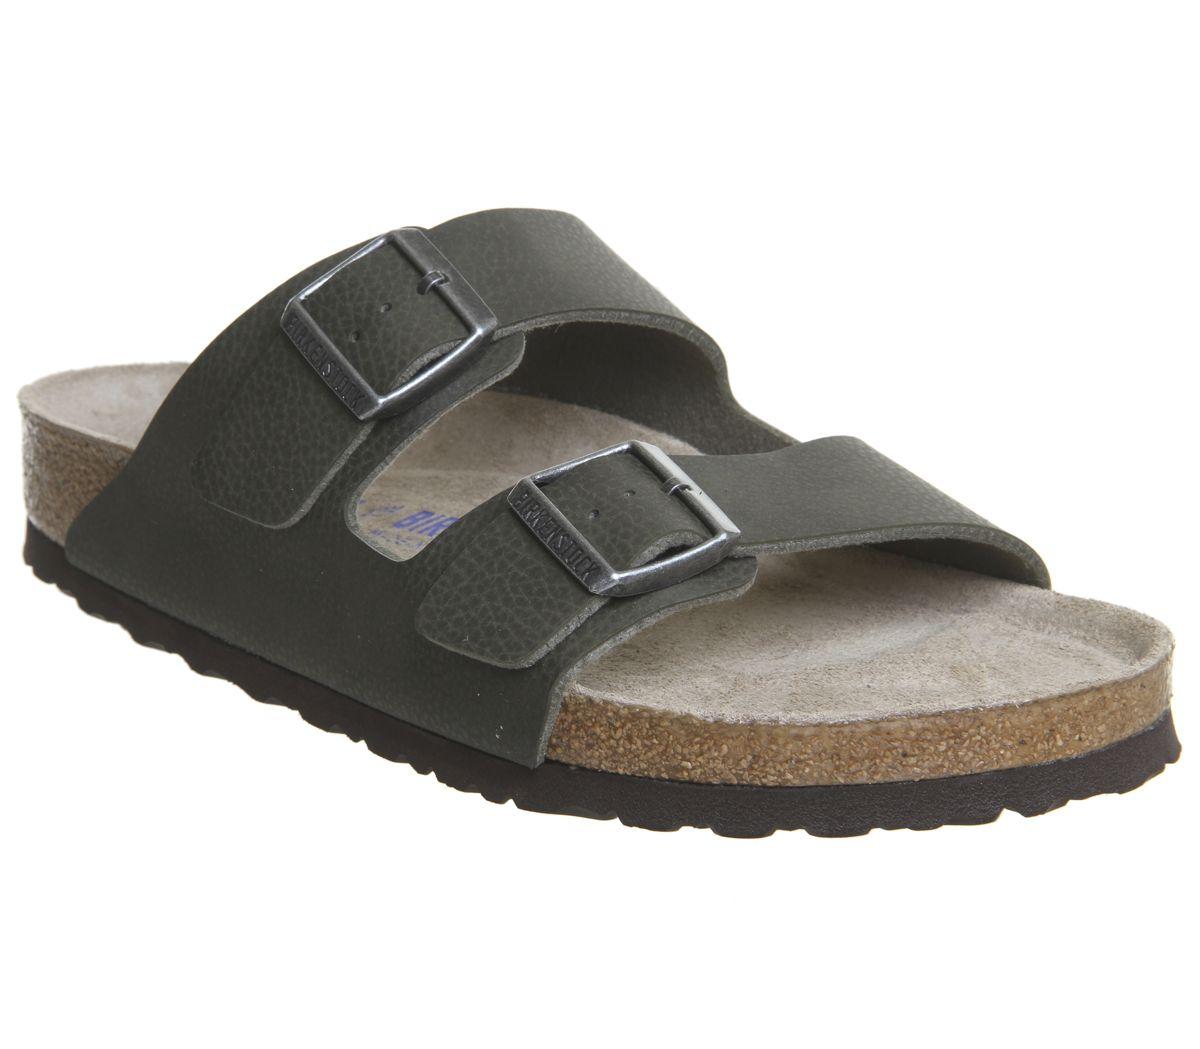 2f2fdf3c222 Birkenstock Arizona Two Strap Sandals Desert Soil Green - Sandals